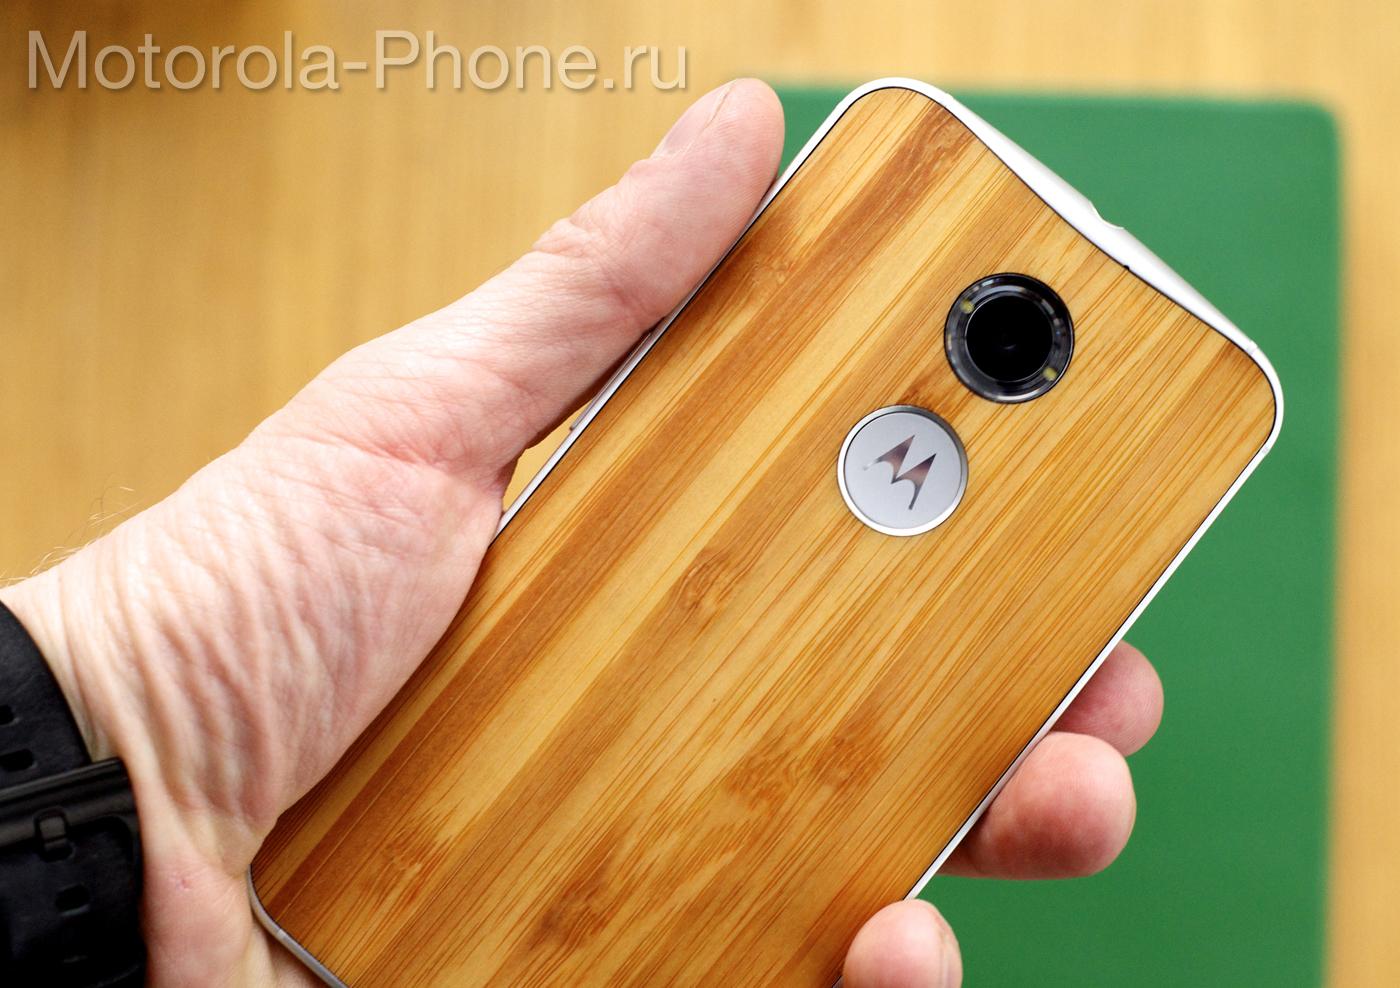 Motorola-Moto-X-Bamboo-05